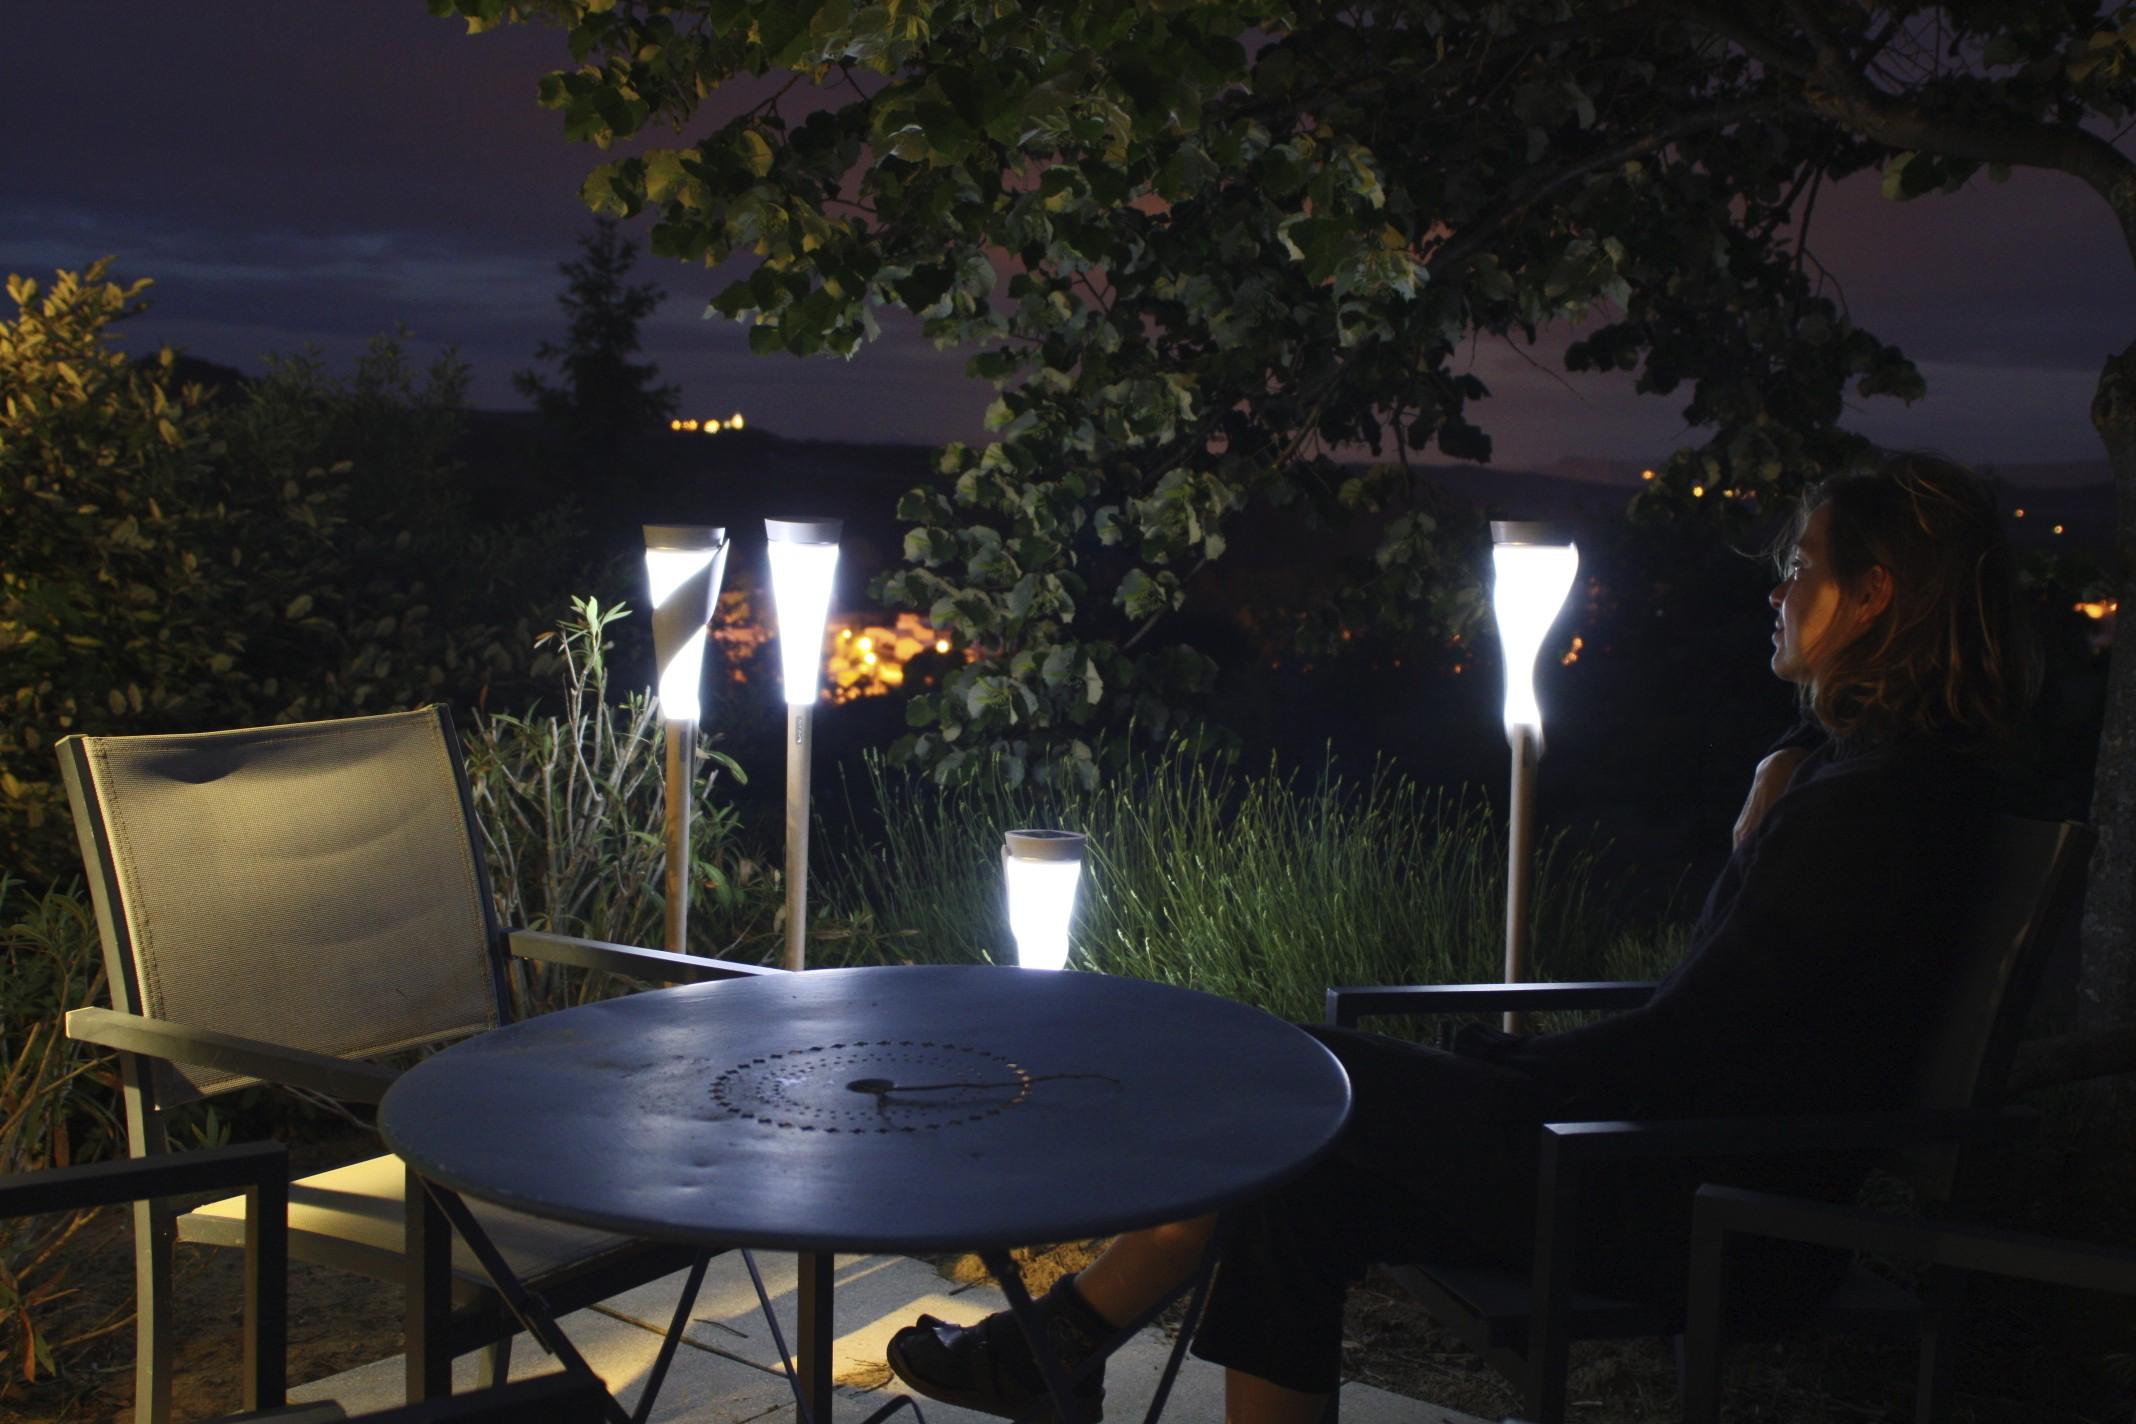 lampe solaire design roseau haut balise borne solaires. Black Bedroom Furniture Sets. Home Design Ideas